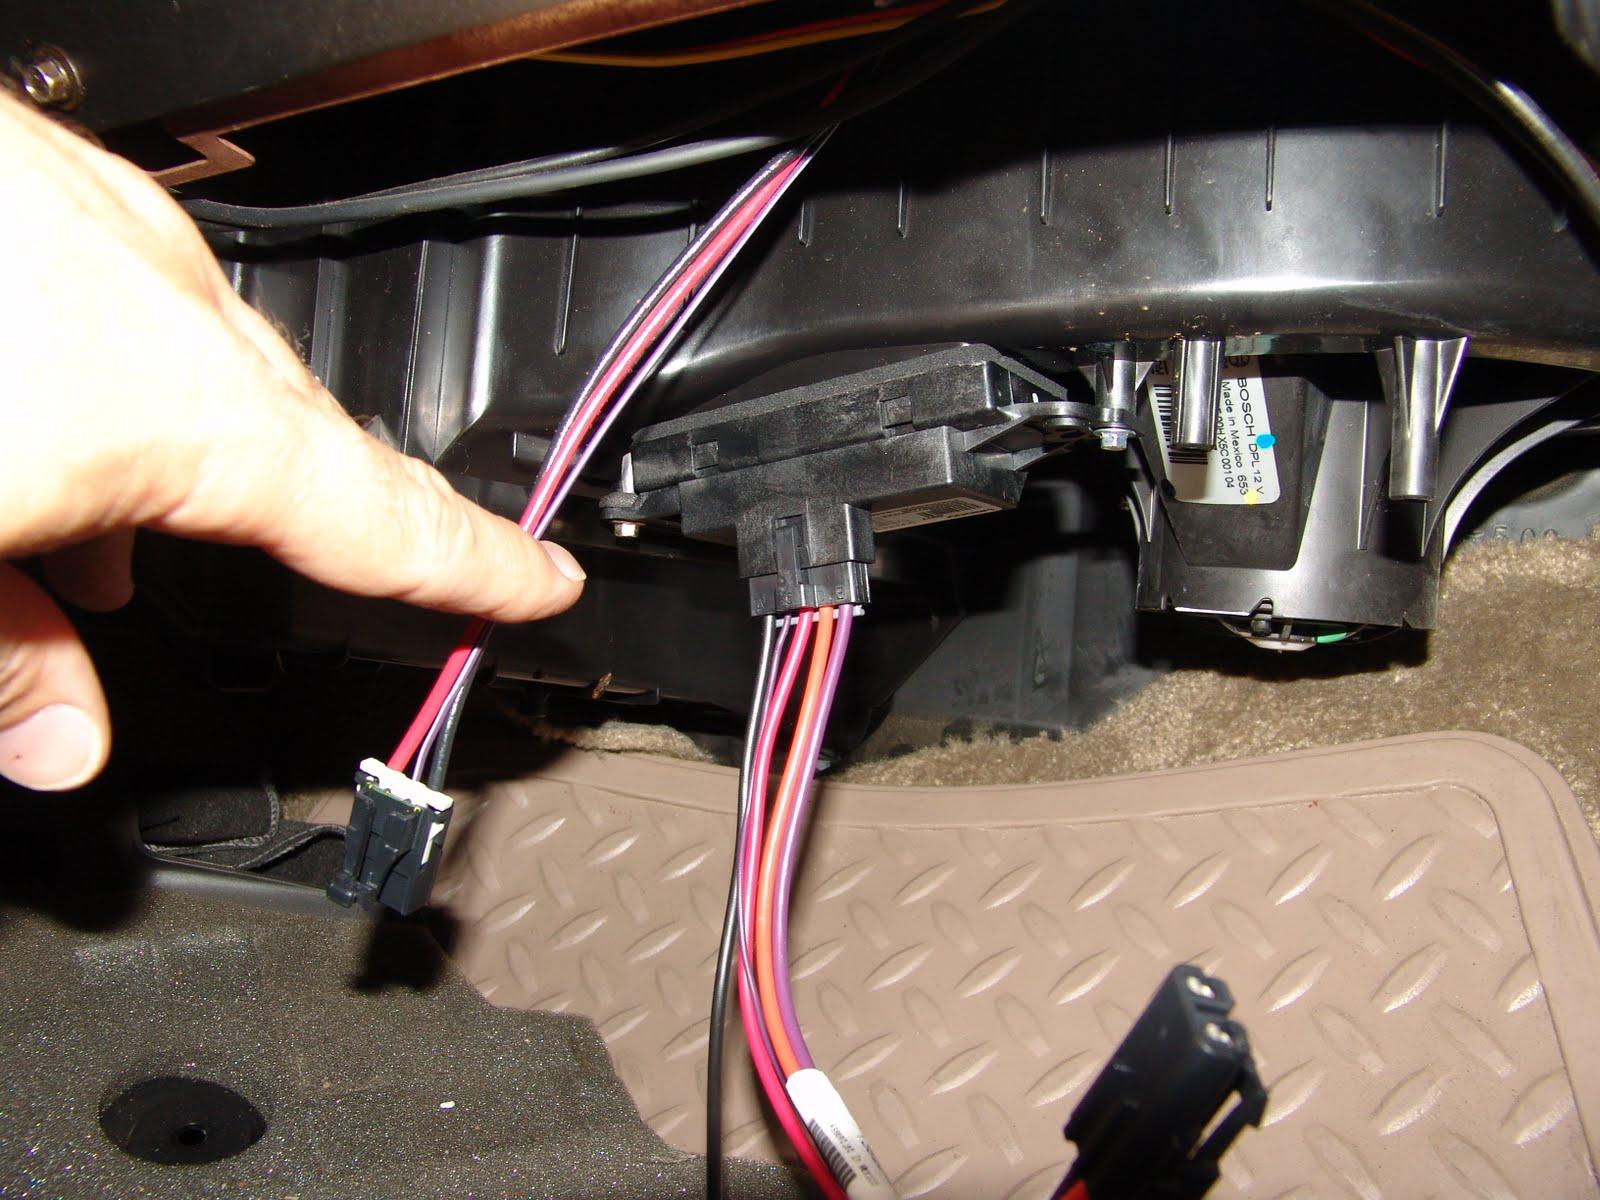 gmc savana 3500 radio wiring diagram gmc fuel pump wiring 2003 chevrolet blazer fuse box #15